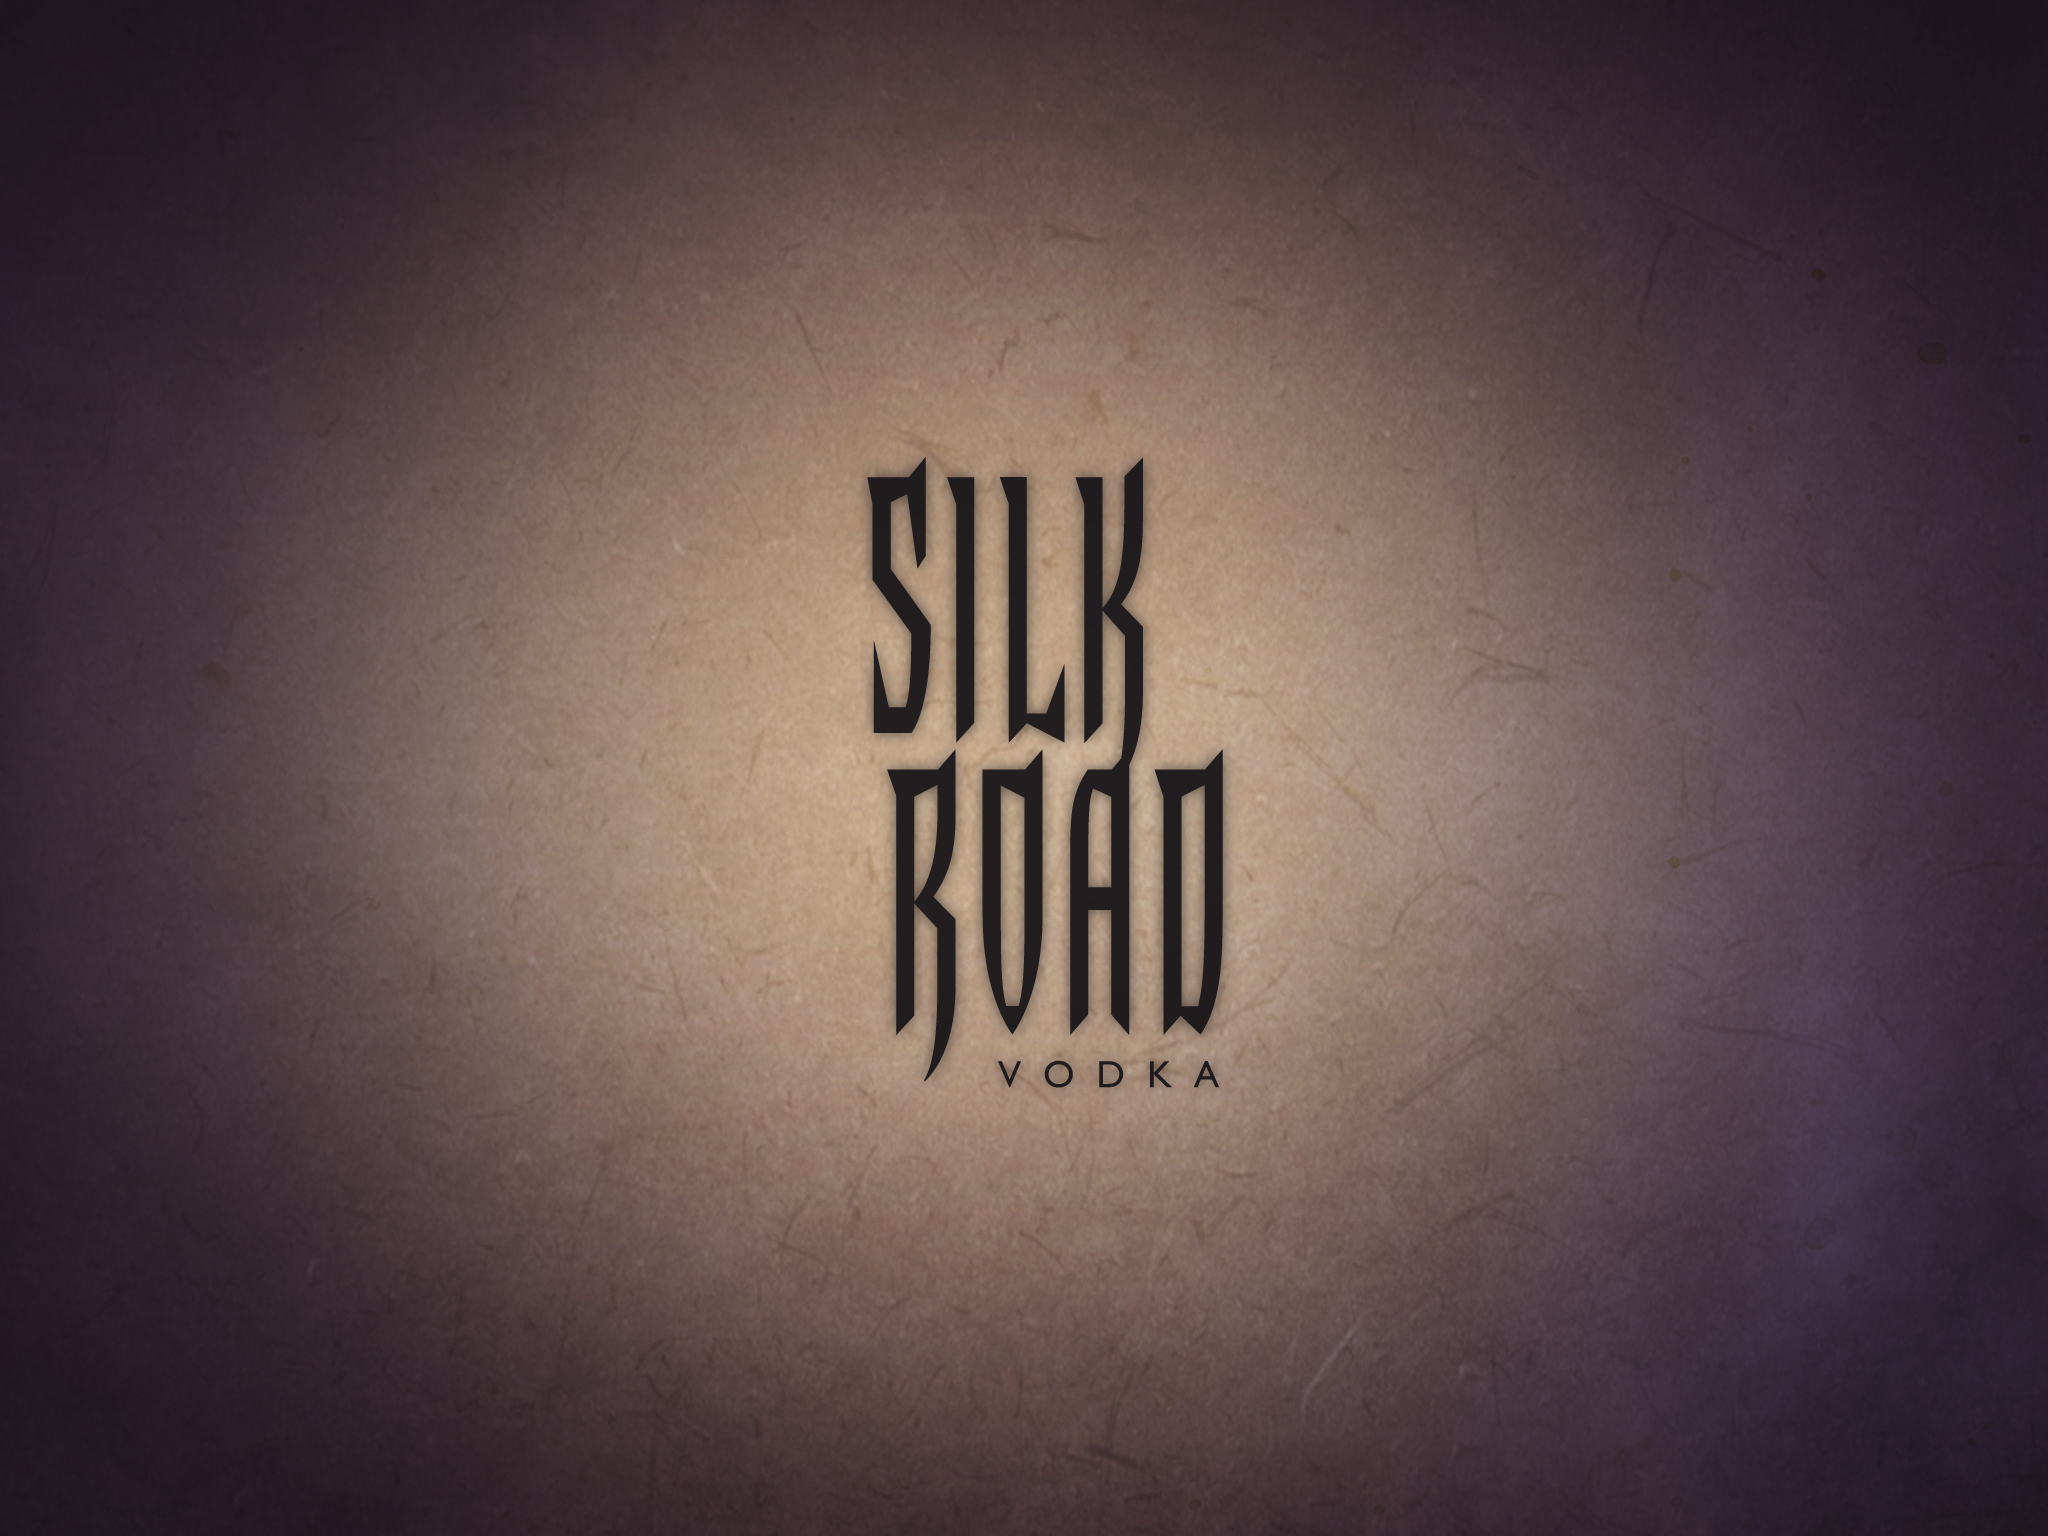 Silk Road Vodka